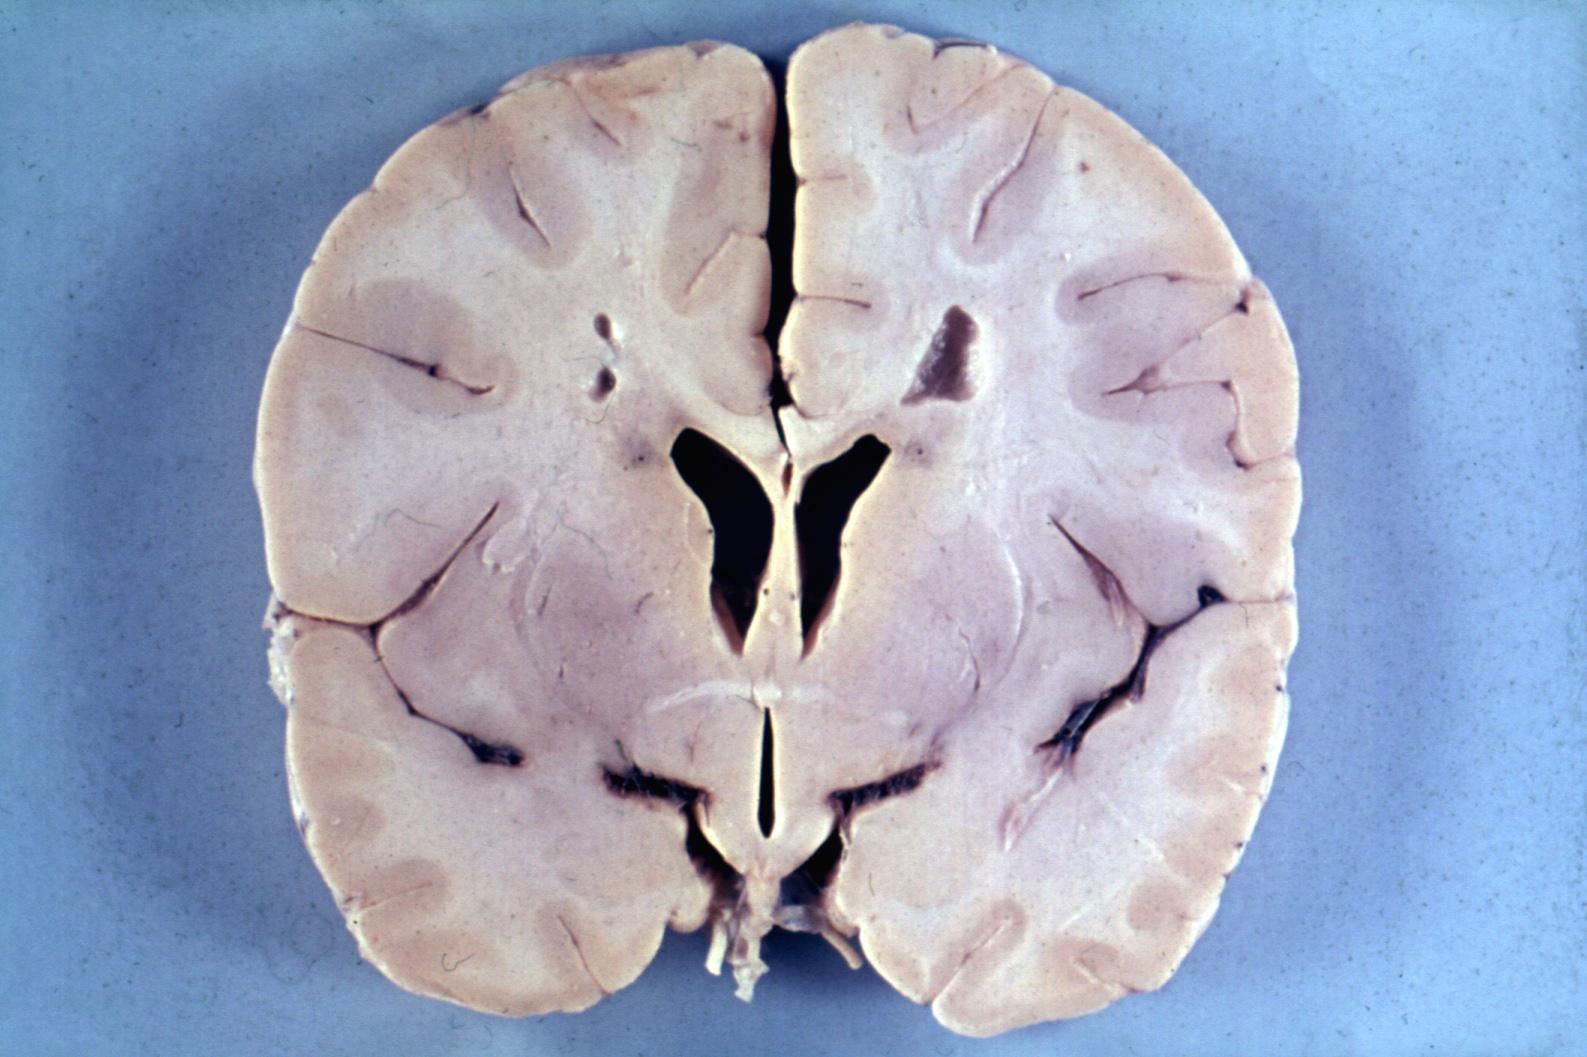 مرض الإسكندر, ماهو مرض الإسكندر, اعراض مرض الإسكندر